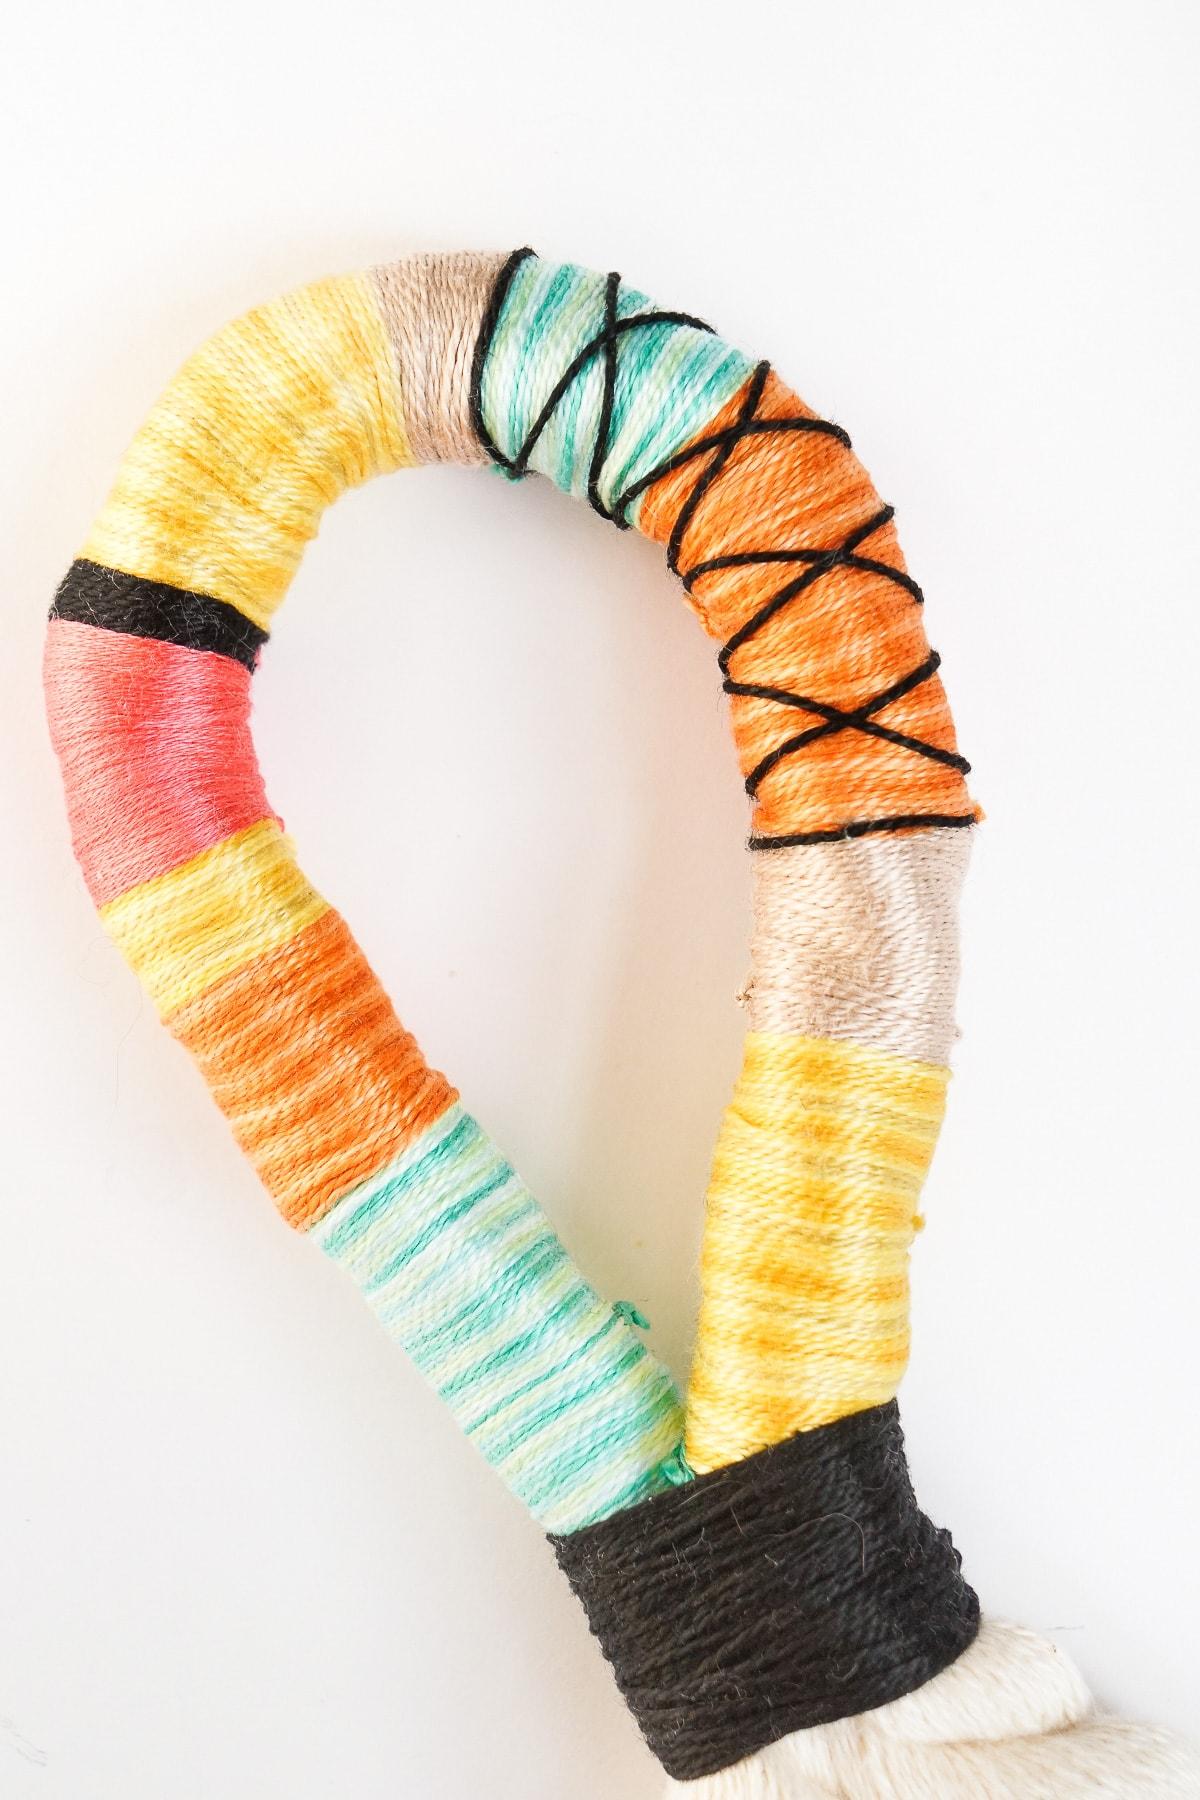 Step 5 -DIY Door Handle Tassels by Ashley Rose of Sugar & Cloth, a top lifestyle blog in Houston, Texas #DIY #door #tassels #fringe #colorful #doorhandle #homedecor #simple #rope #diyhomedecor